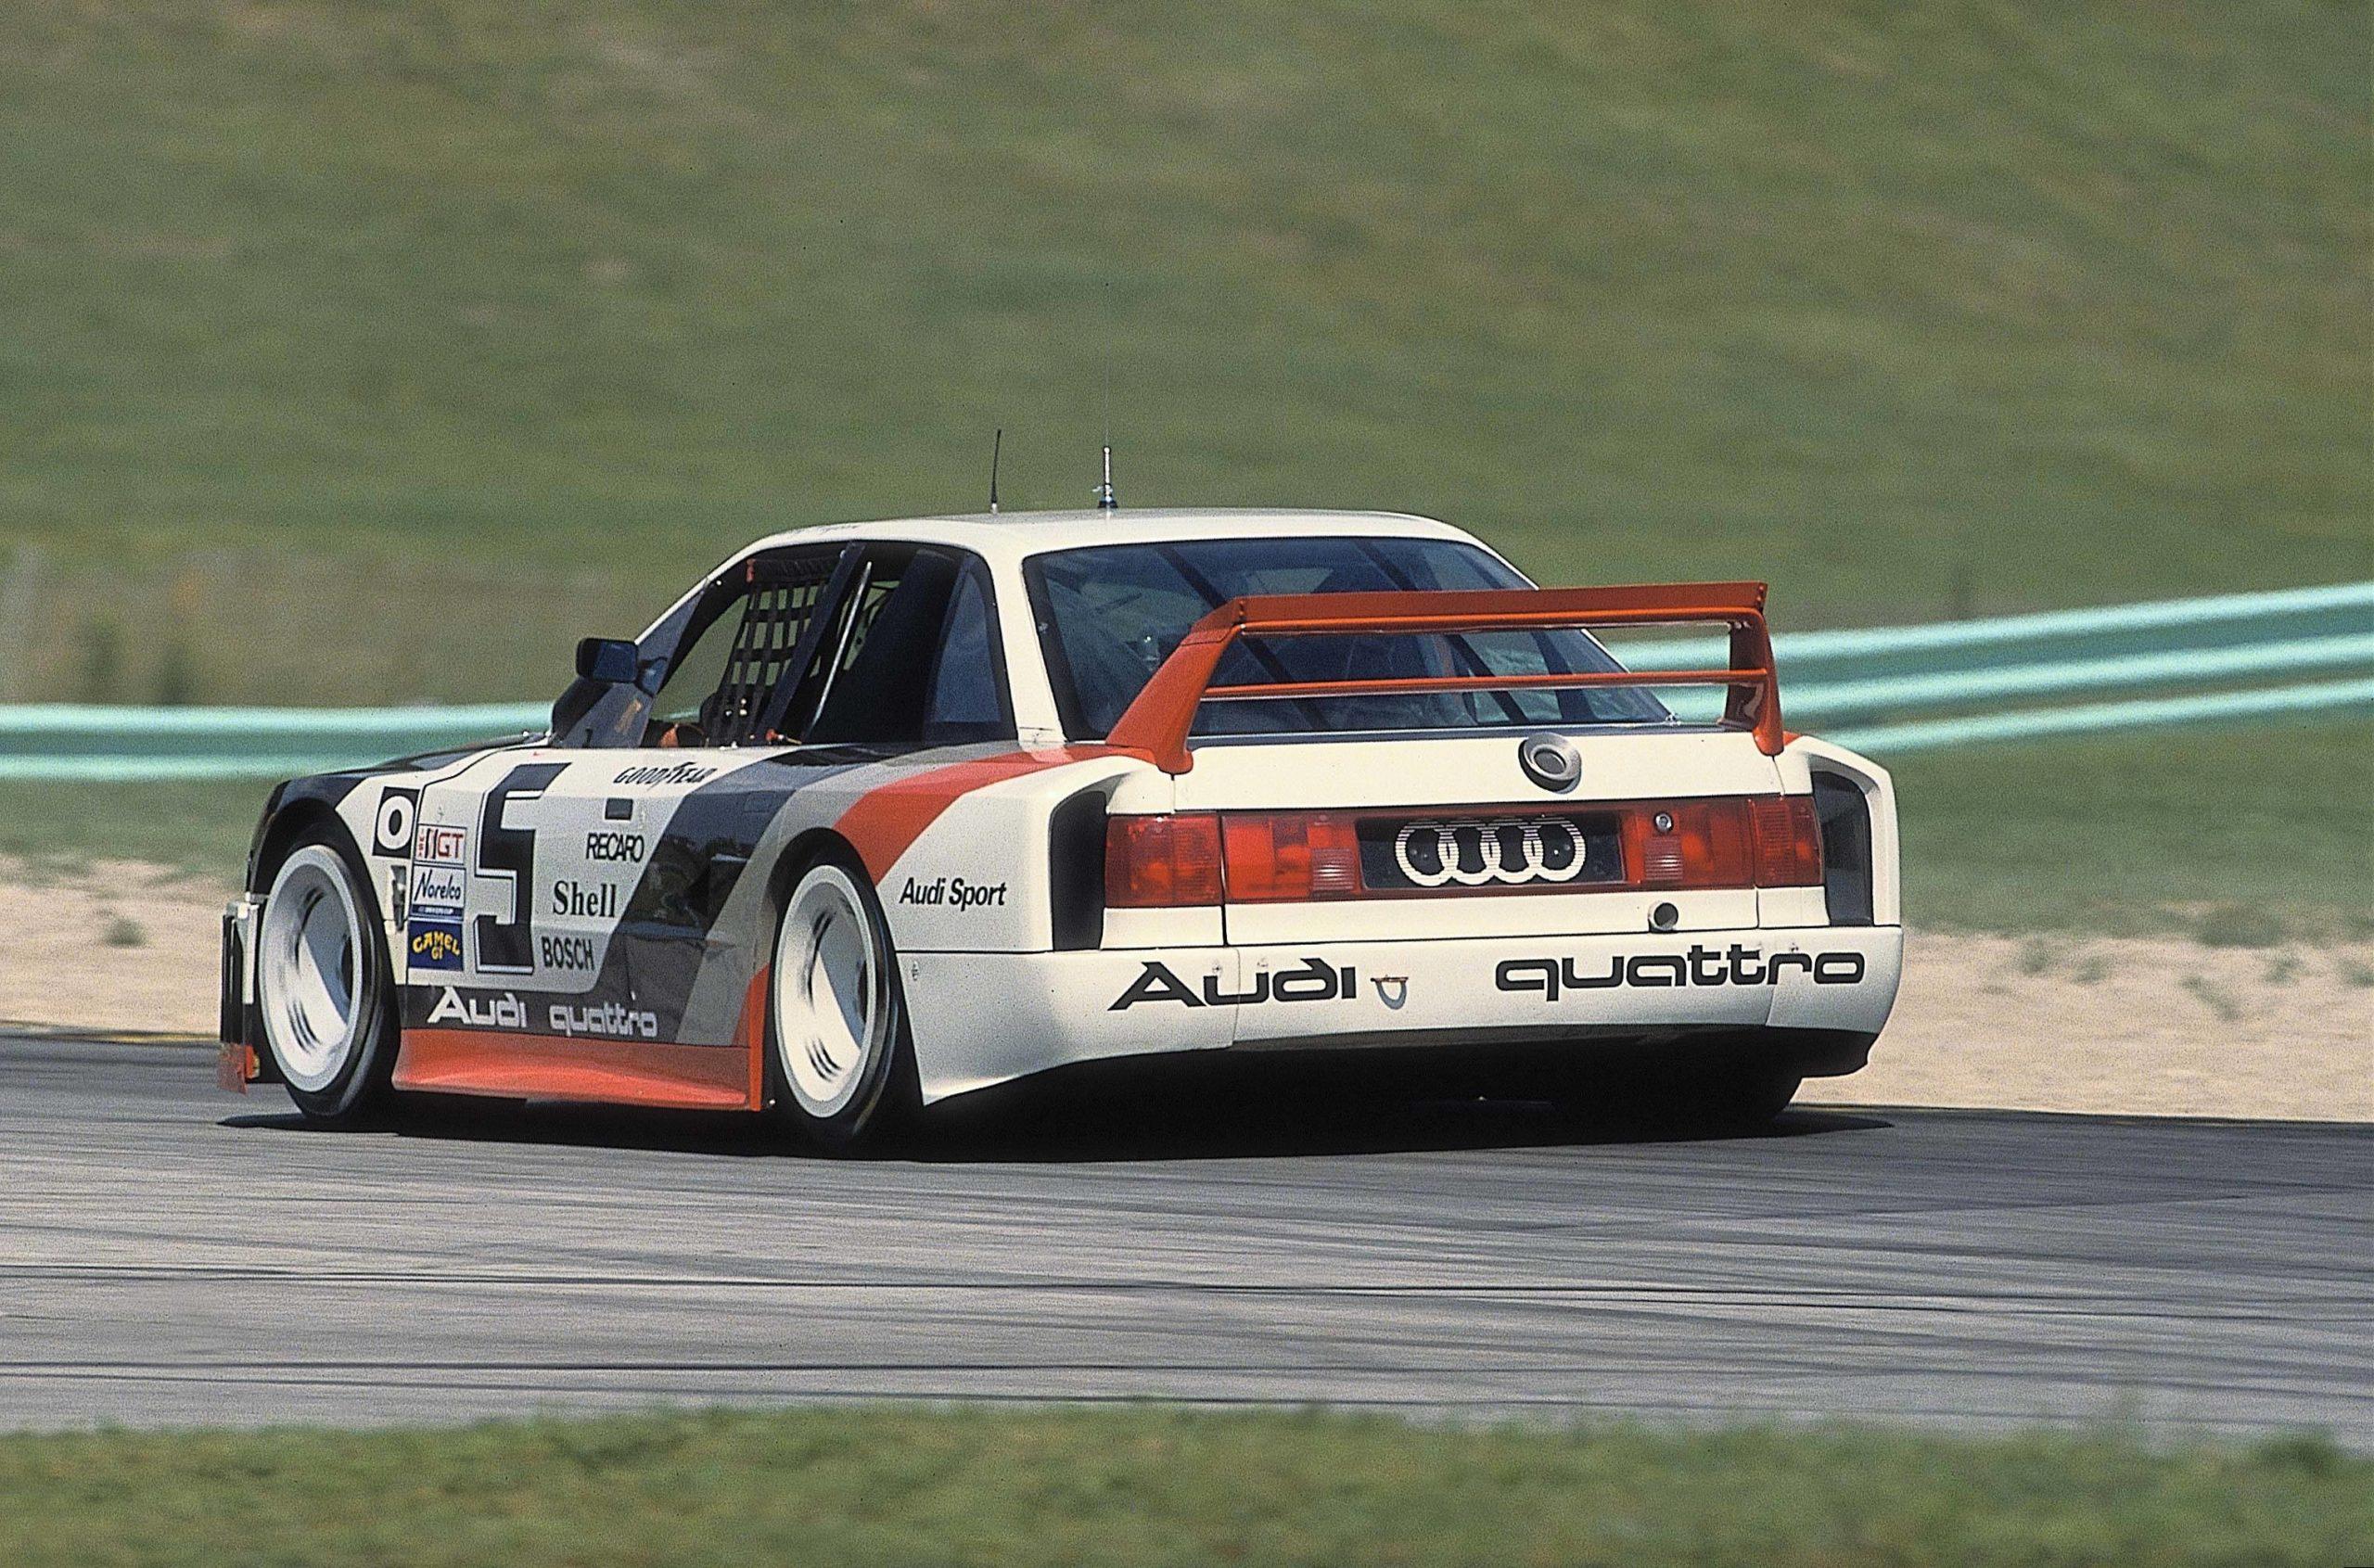 1989: In the IMSA-GTO Series Hans-Joachim Stuck celebrates seven wins in an Audi 90